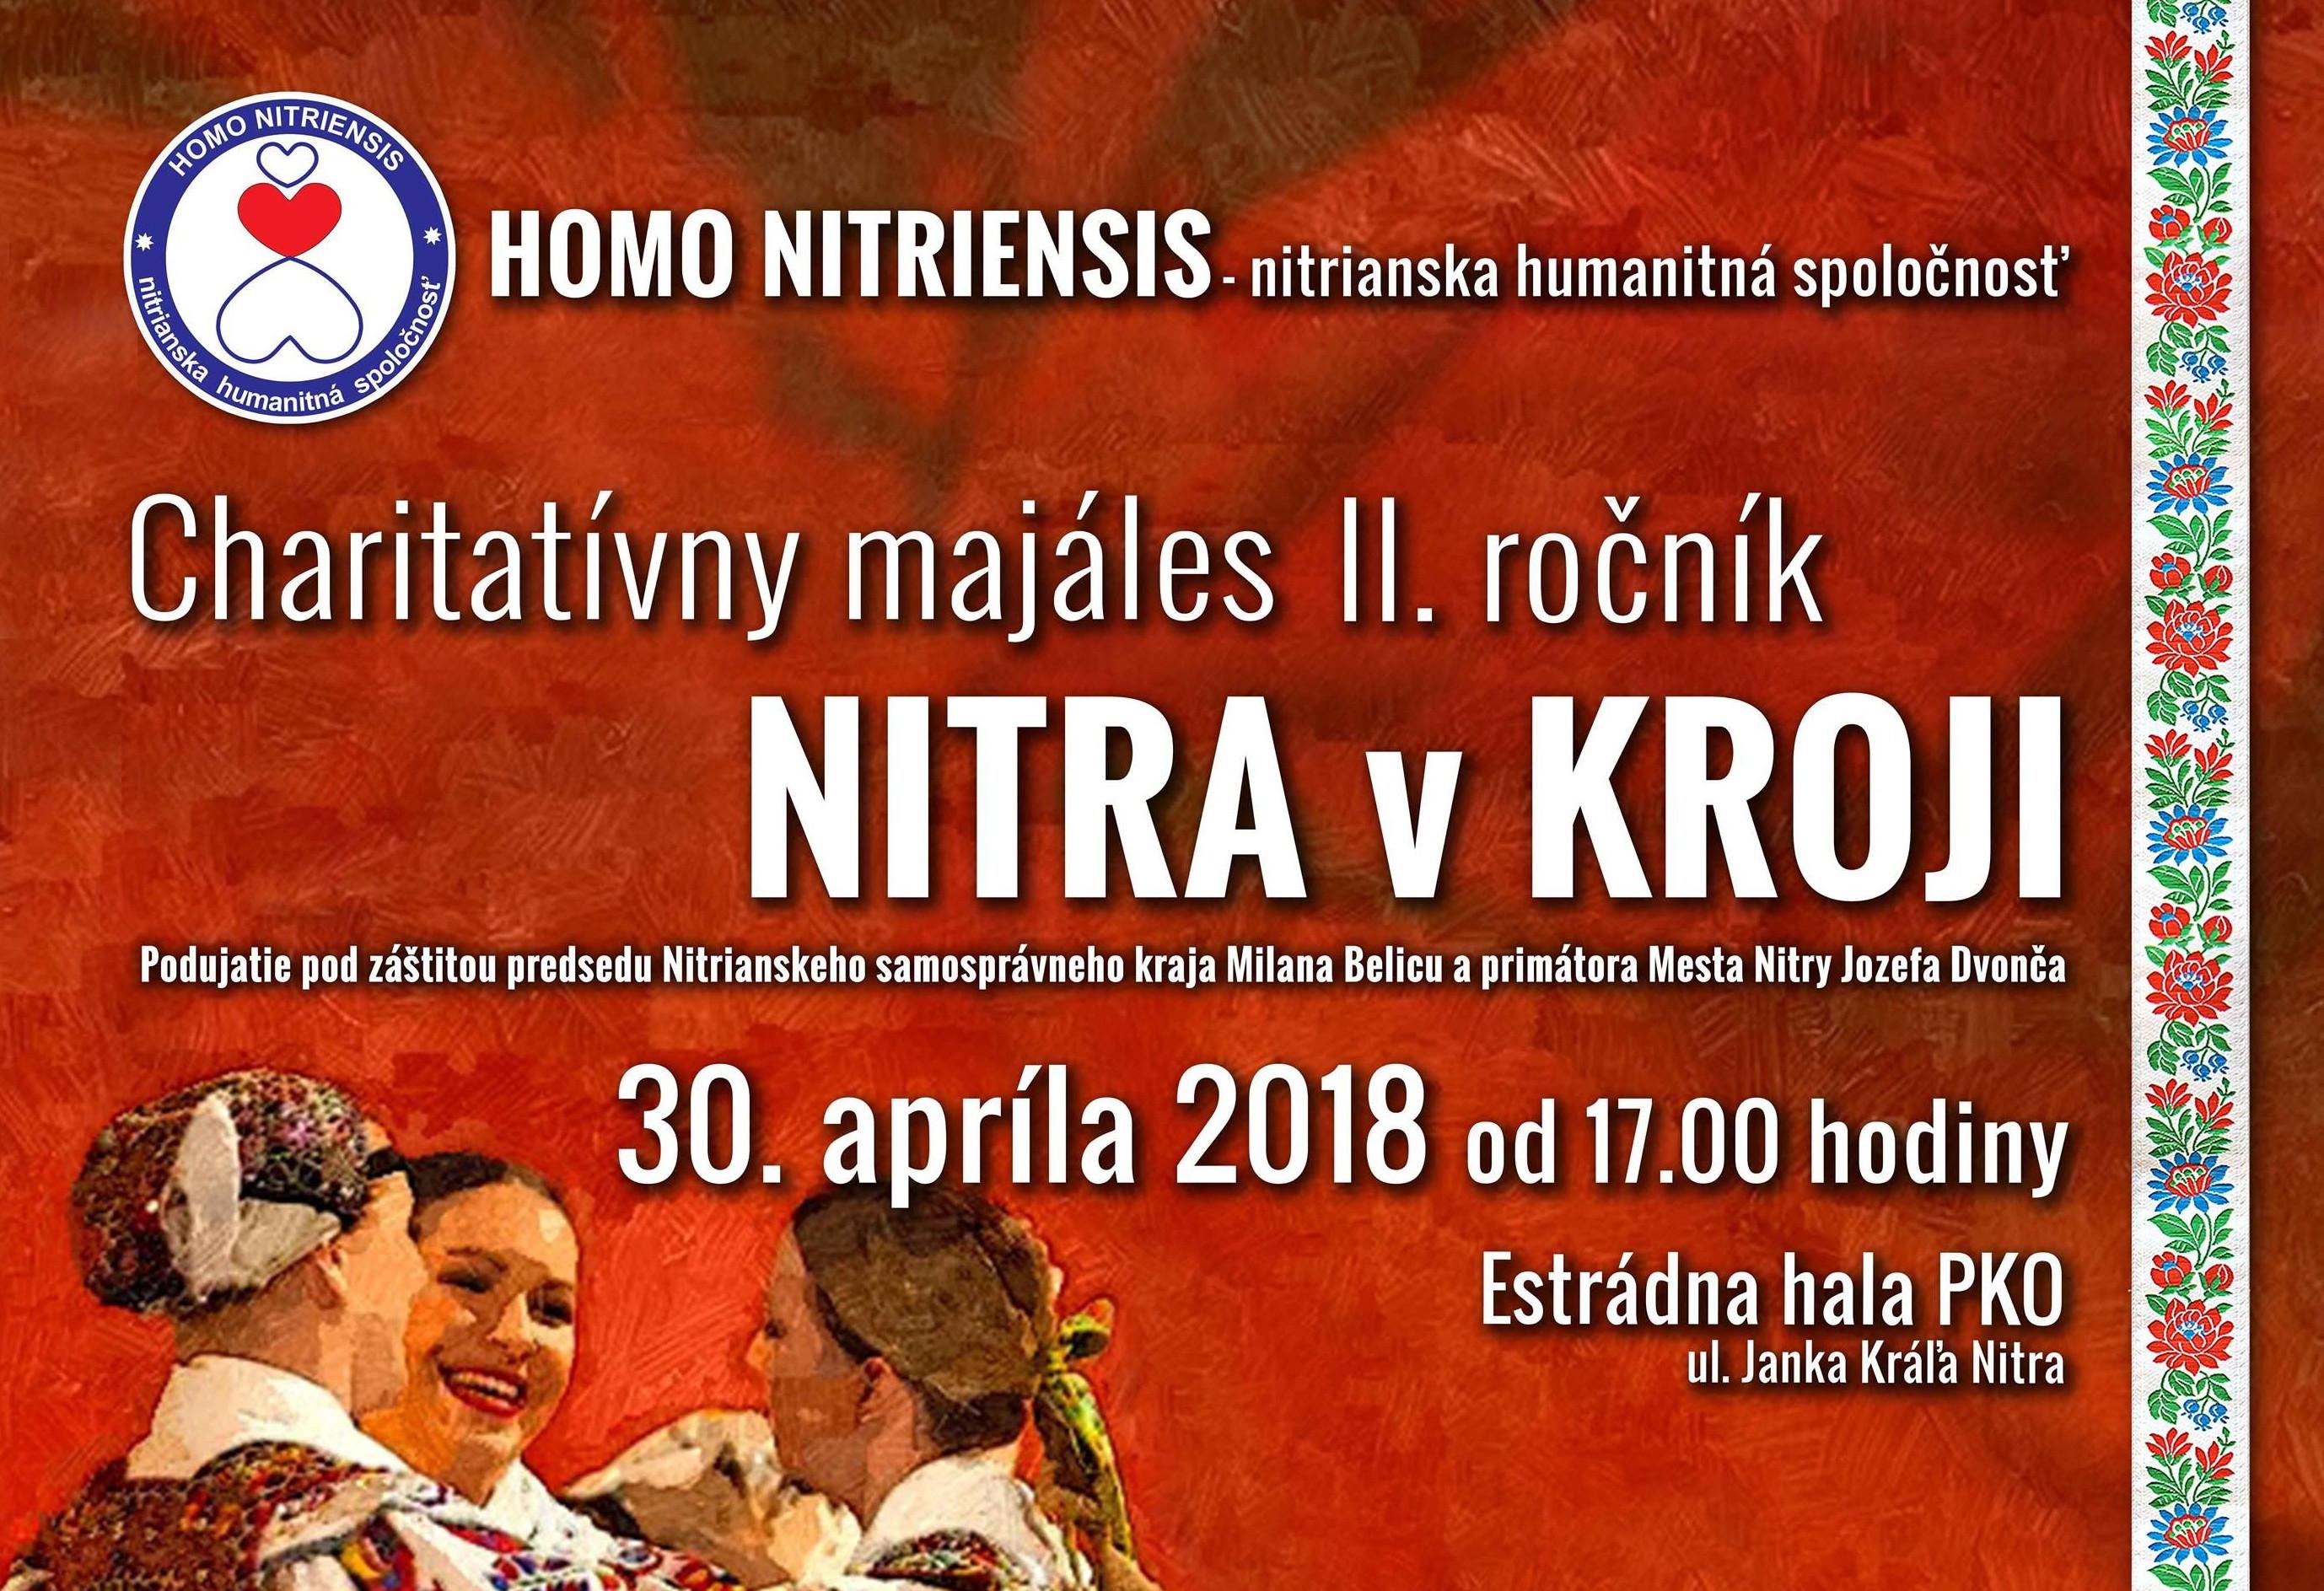 f4b8d51d18f1 Charitatívny Majáles NITRA v KROJI 2018 - Kam v meste